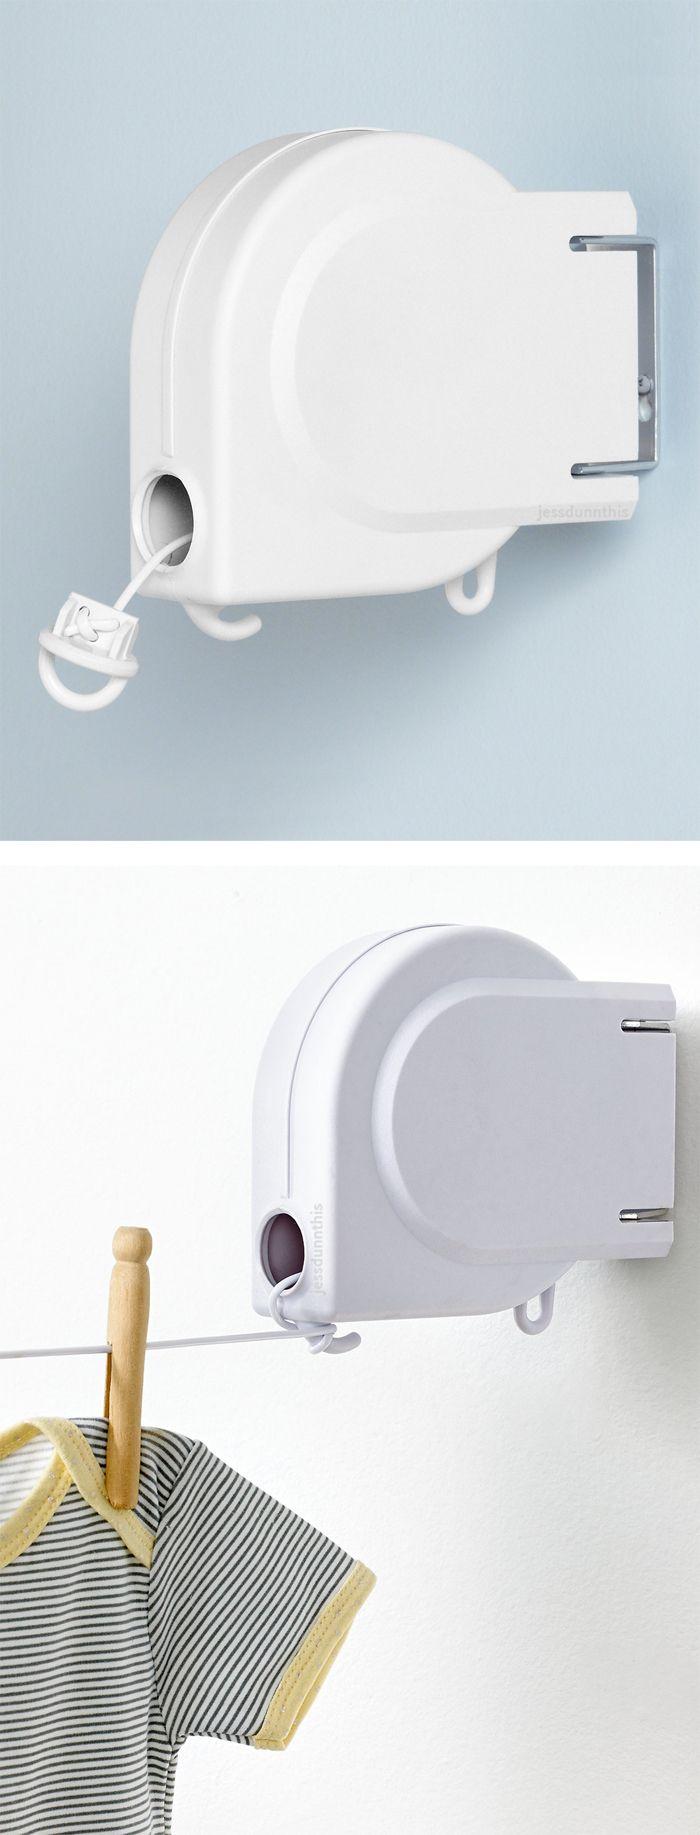 Retractable clothesline #product_design